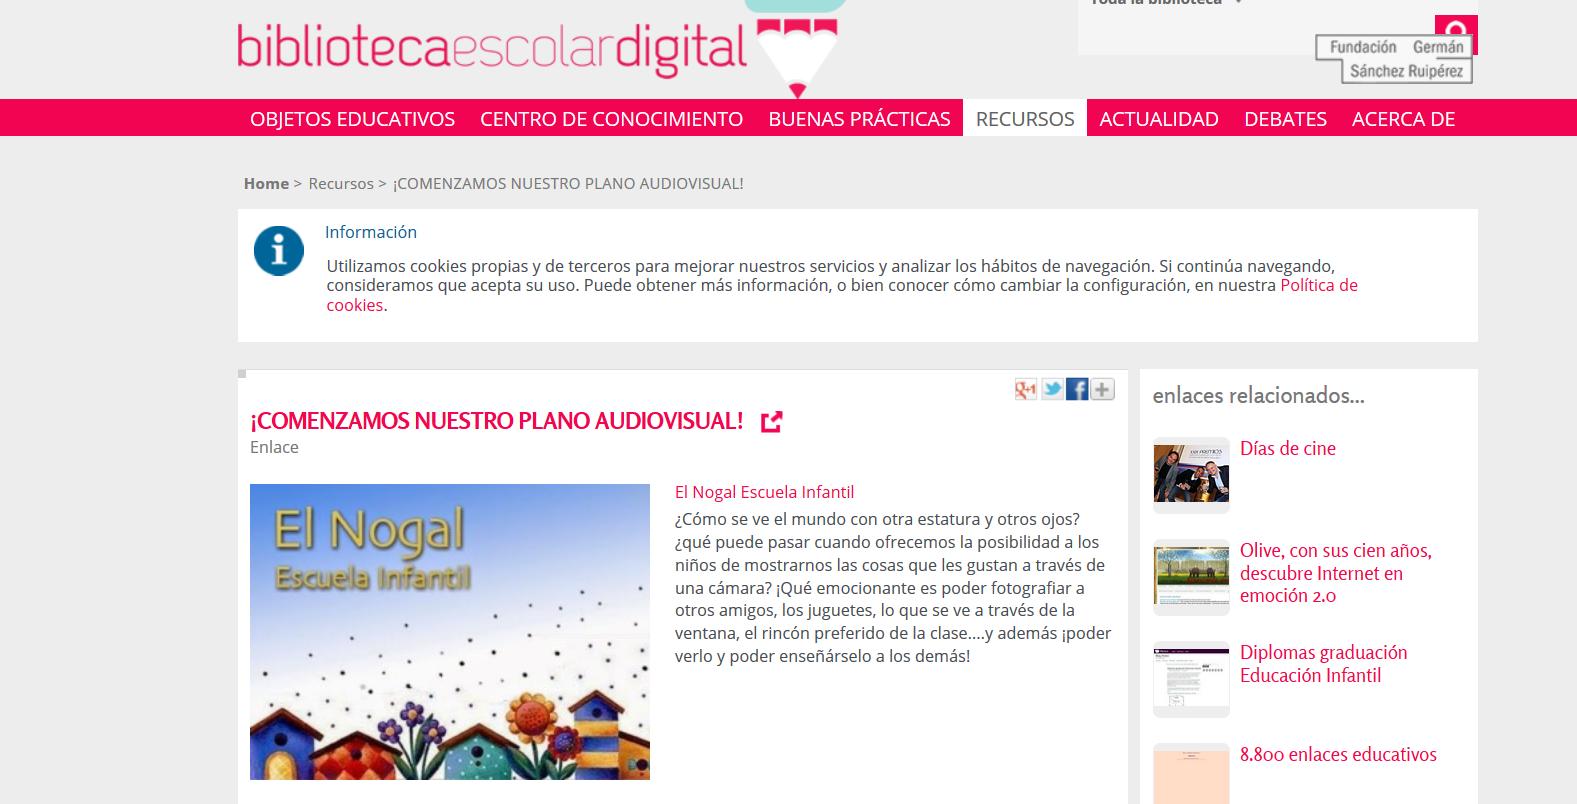 http://bibliotecaescolardigital.es/comunidad/BibliotecaEscolarDigital/recurso/comenzamos-nuestro-plano-audiovisual/6f7749ea-9dd7-4155-b008-711f0c3d9dfd